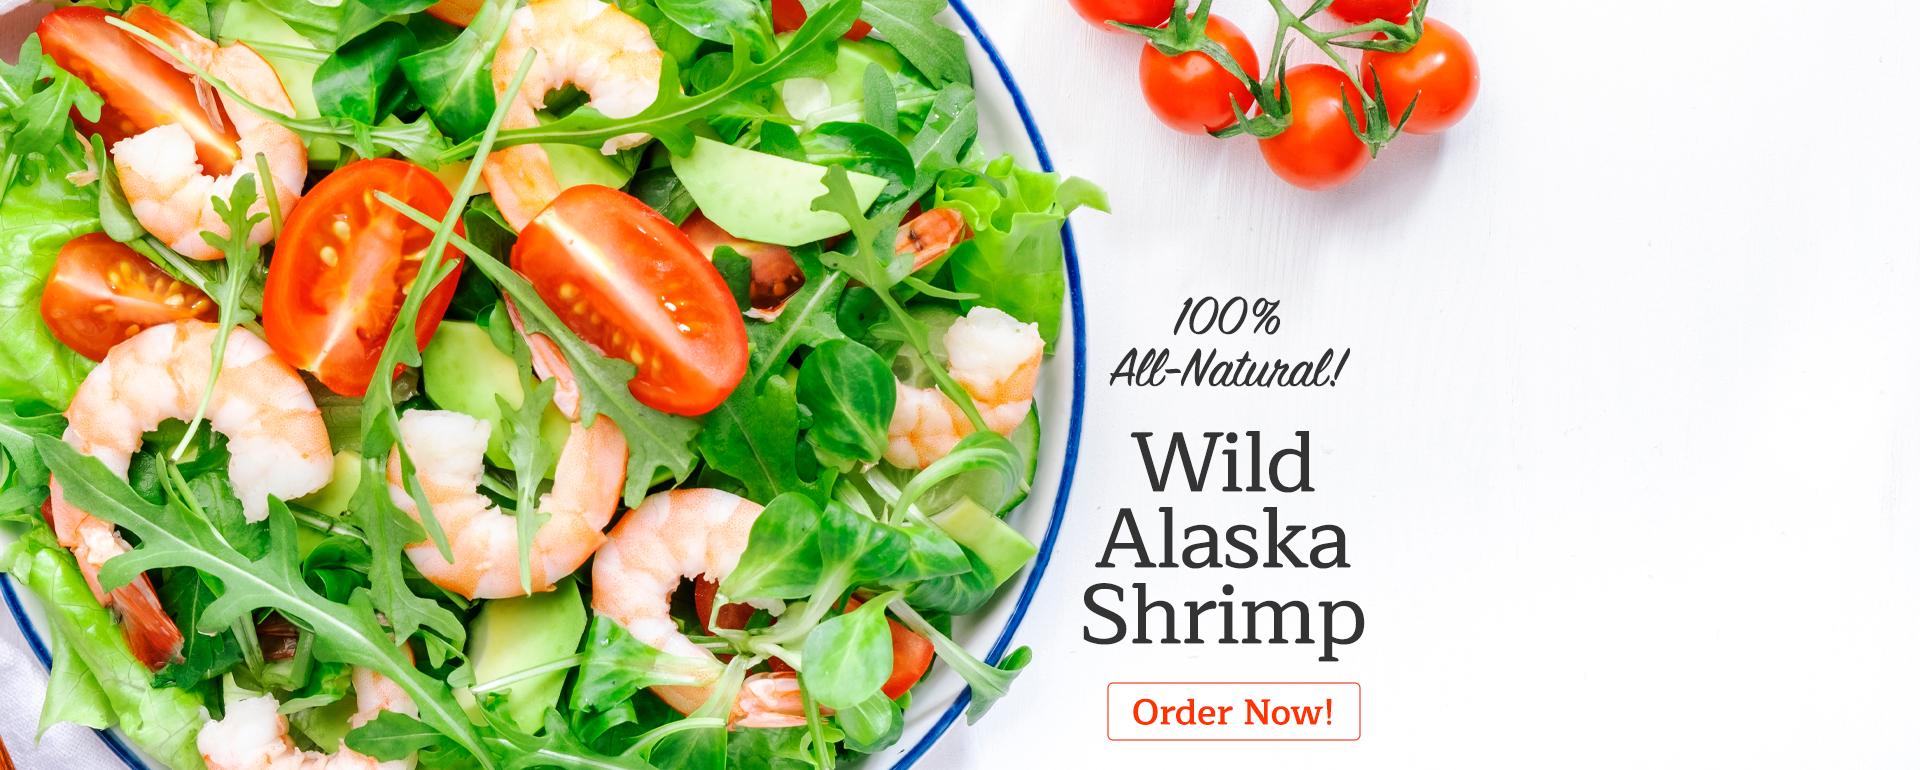 Wild Alaska Shrimp